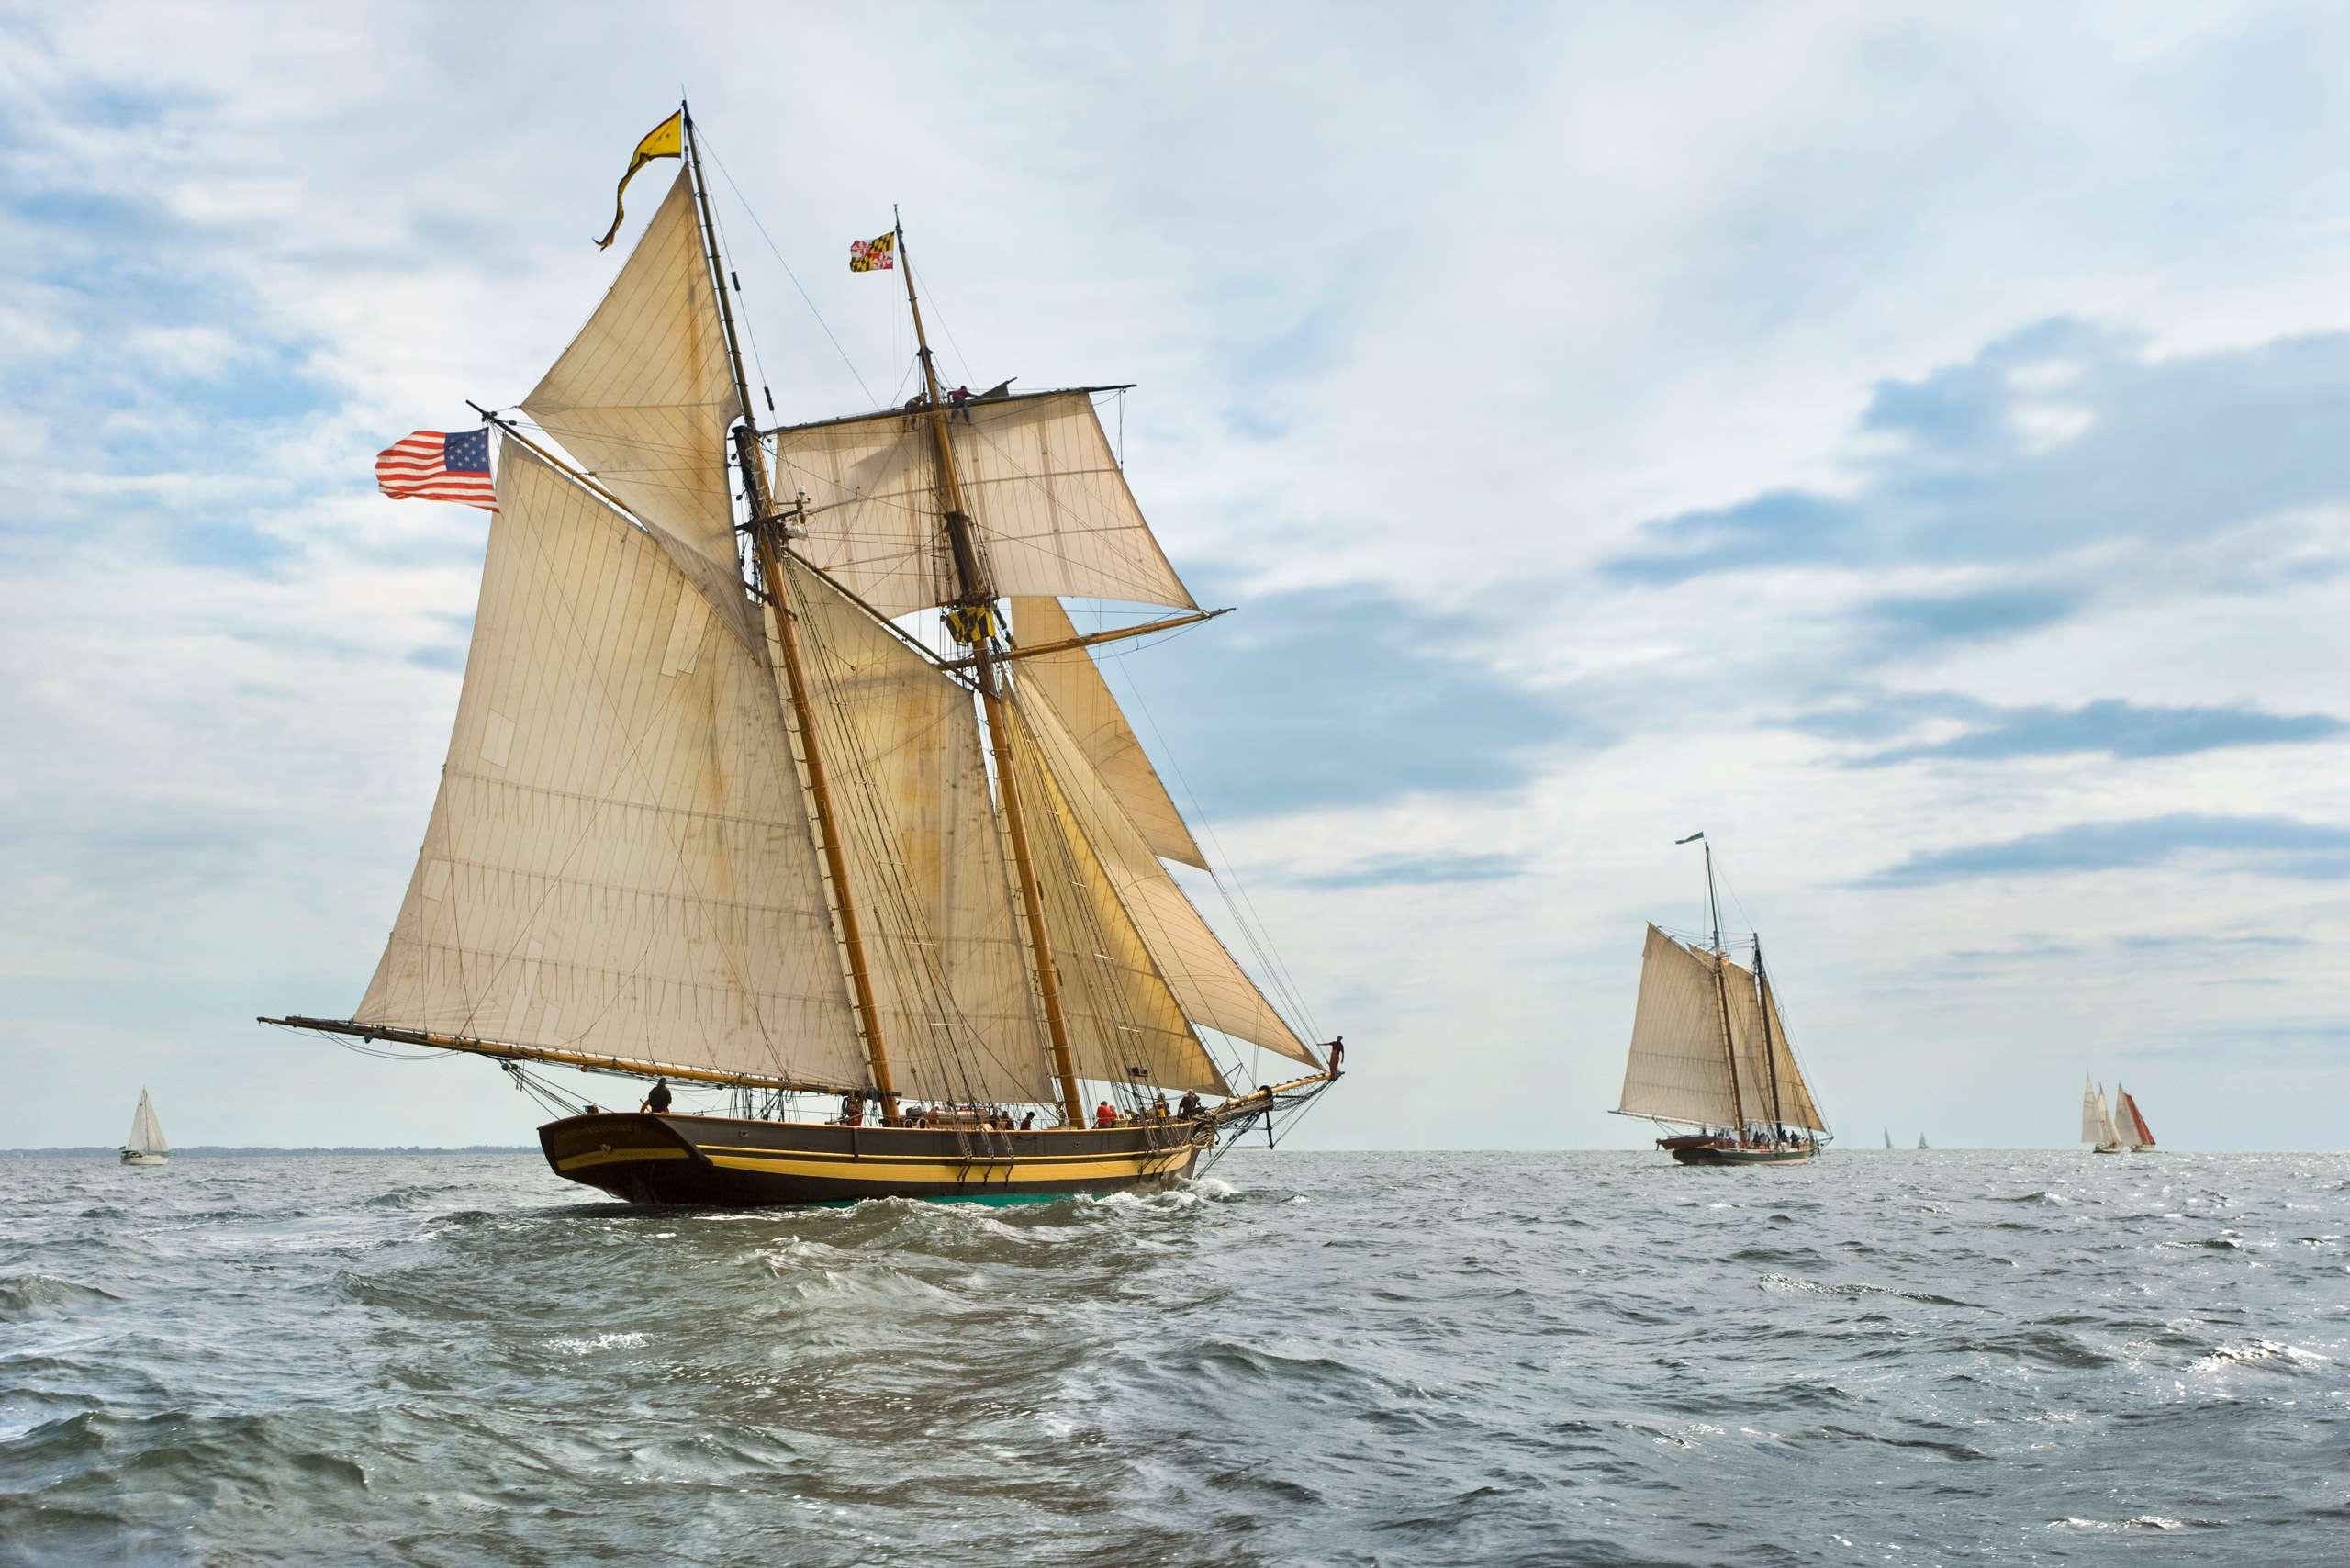 PORTFOLIO - Sailing - Tall Ships #13-PCG590